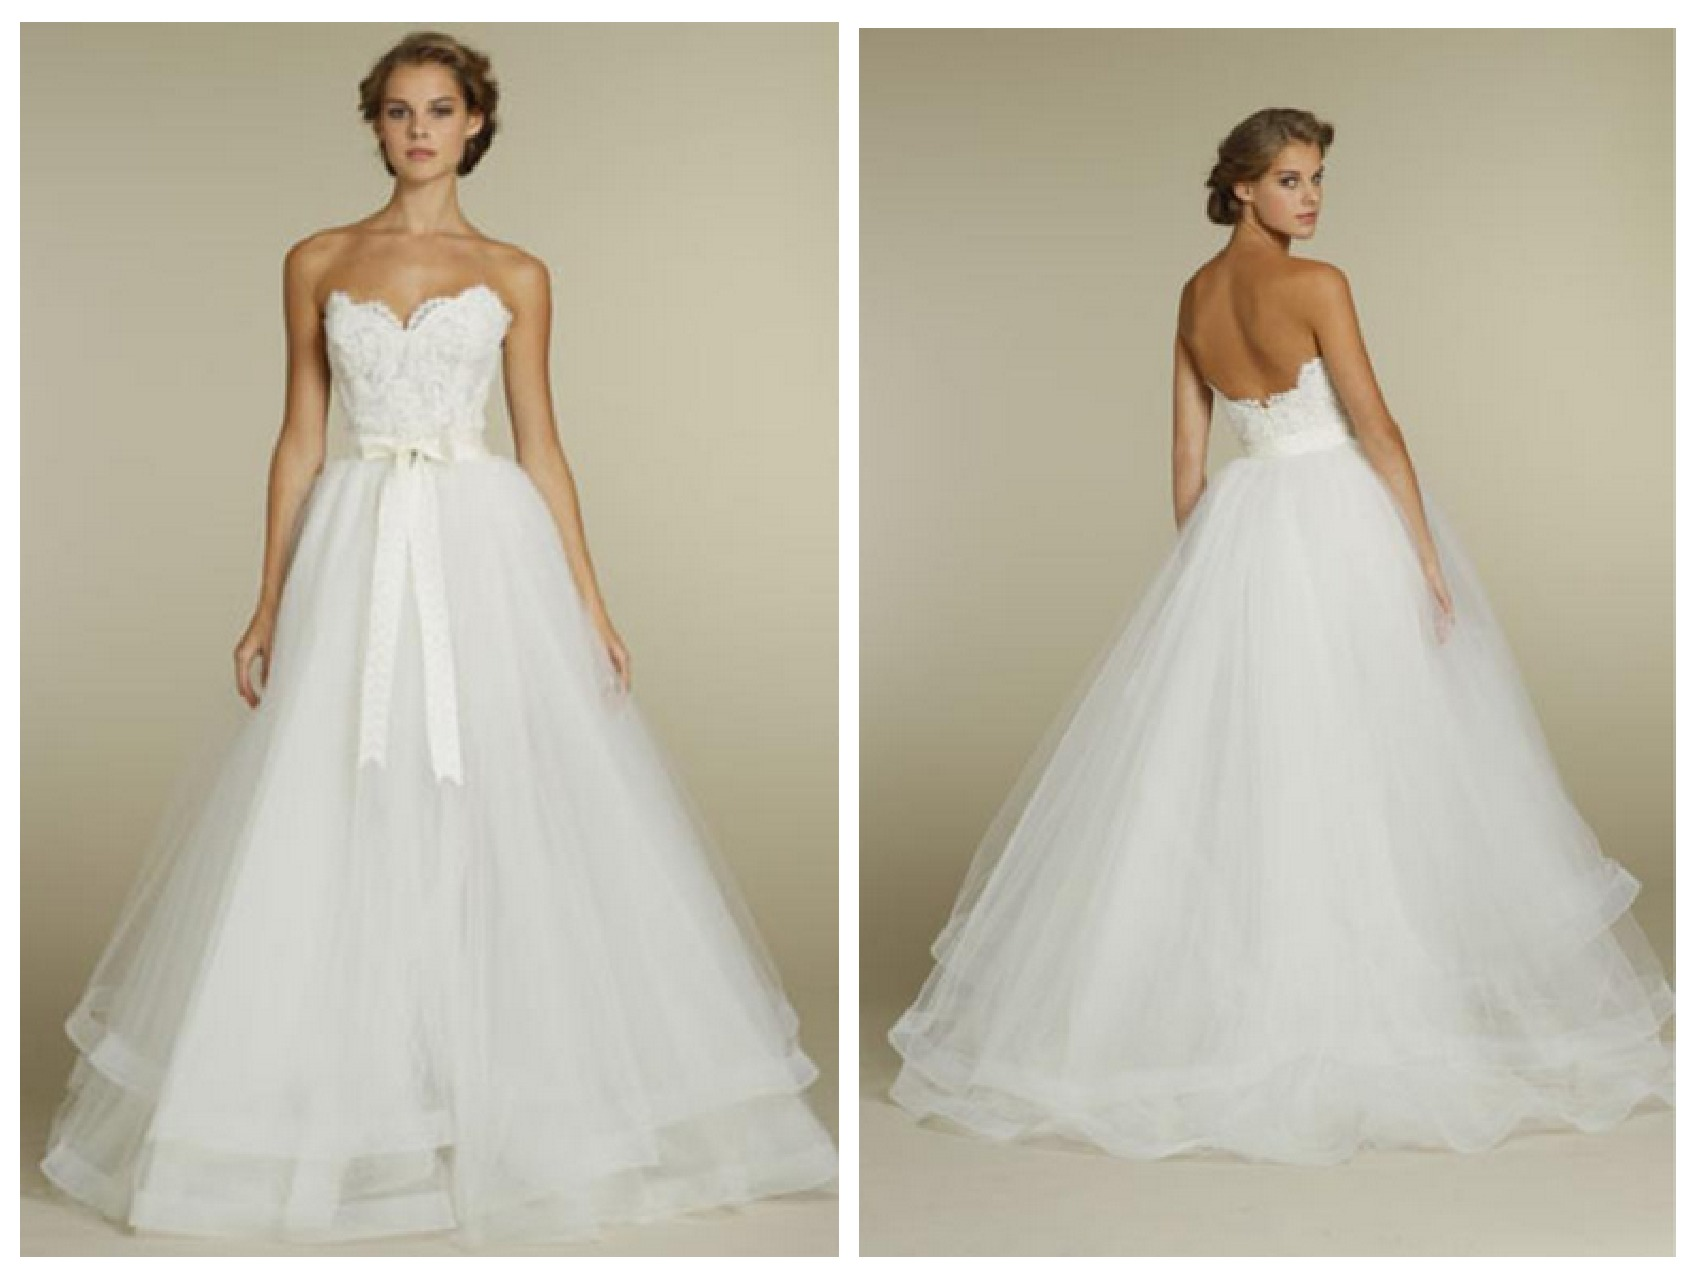 wedding dresses tulle tulle wedding dress Wedding Dresses Tulle 97